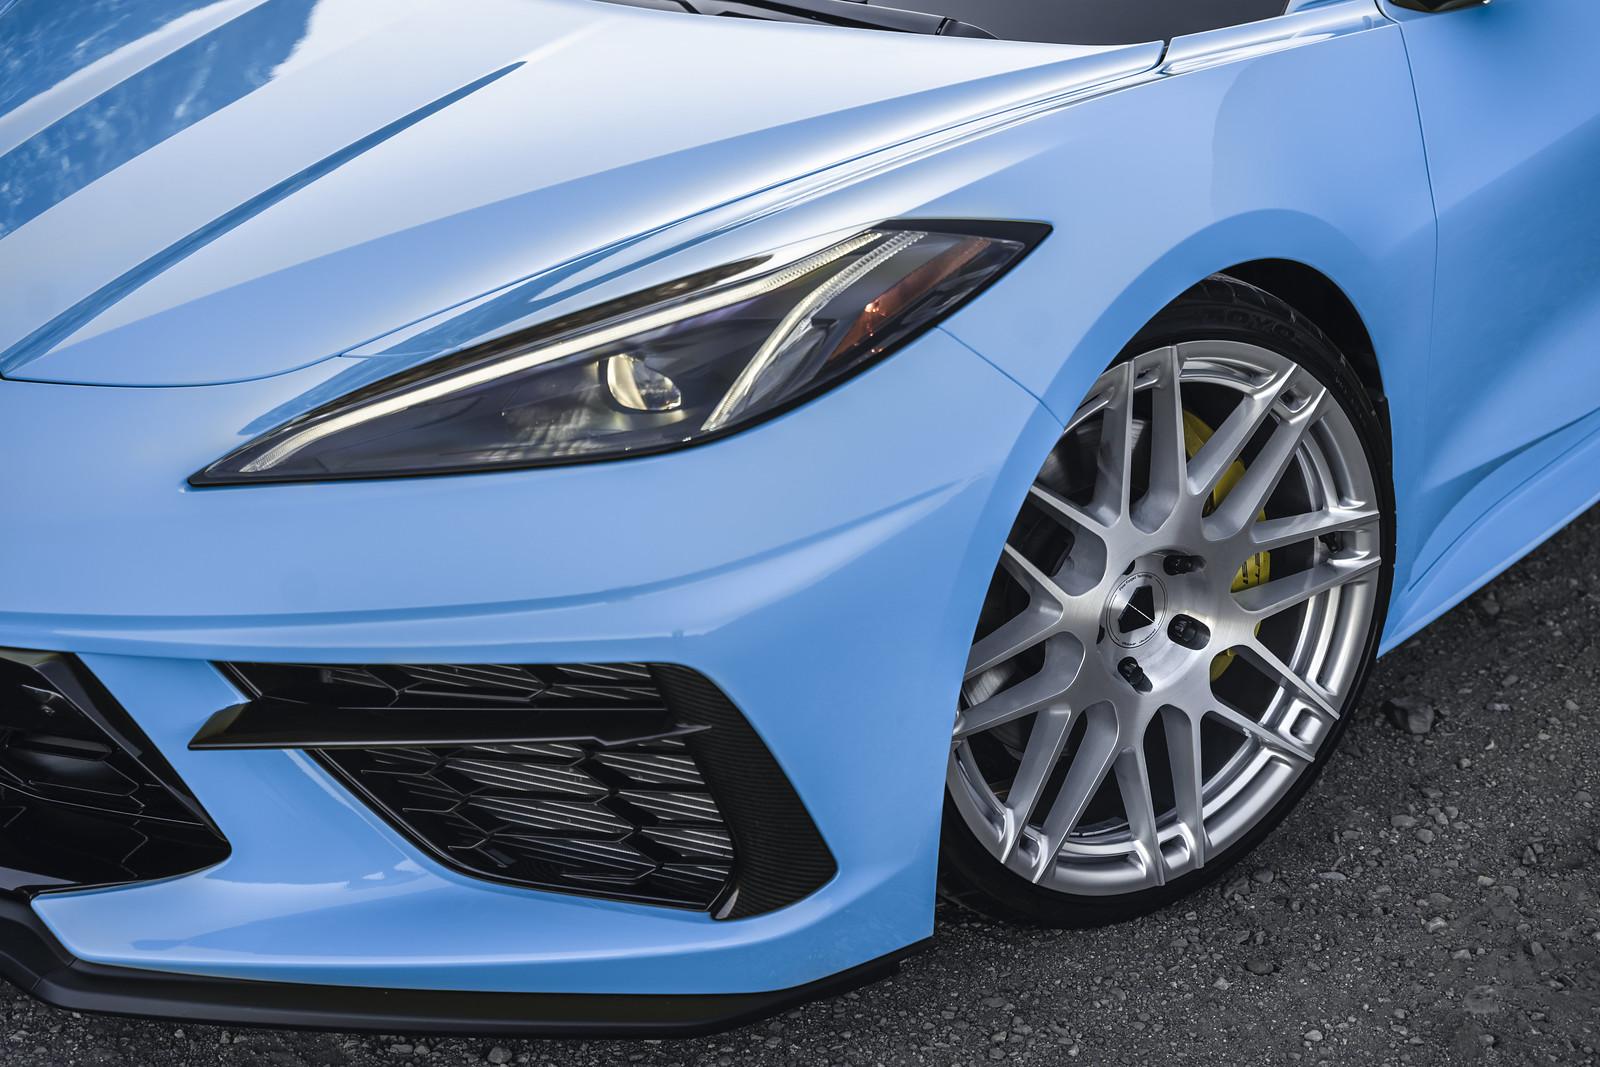 2020_Chevrolet_Corvette_C8_Rapid_Blue_BDF12_Brushed_Silver_6